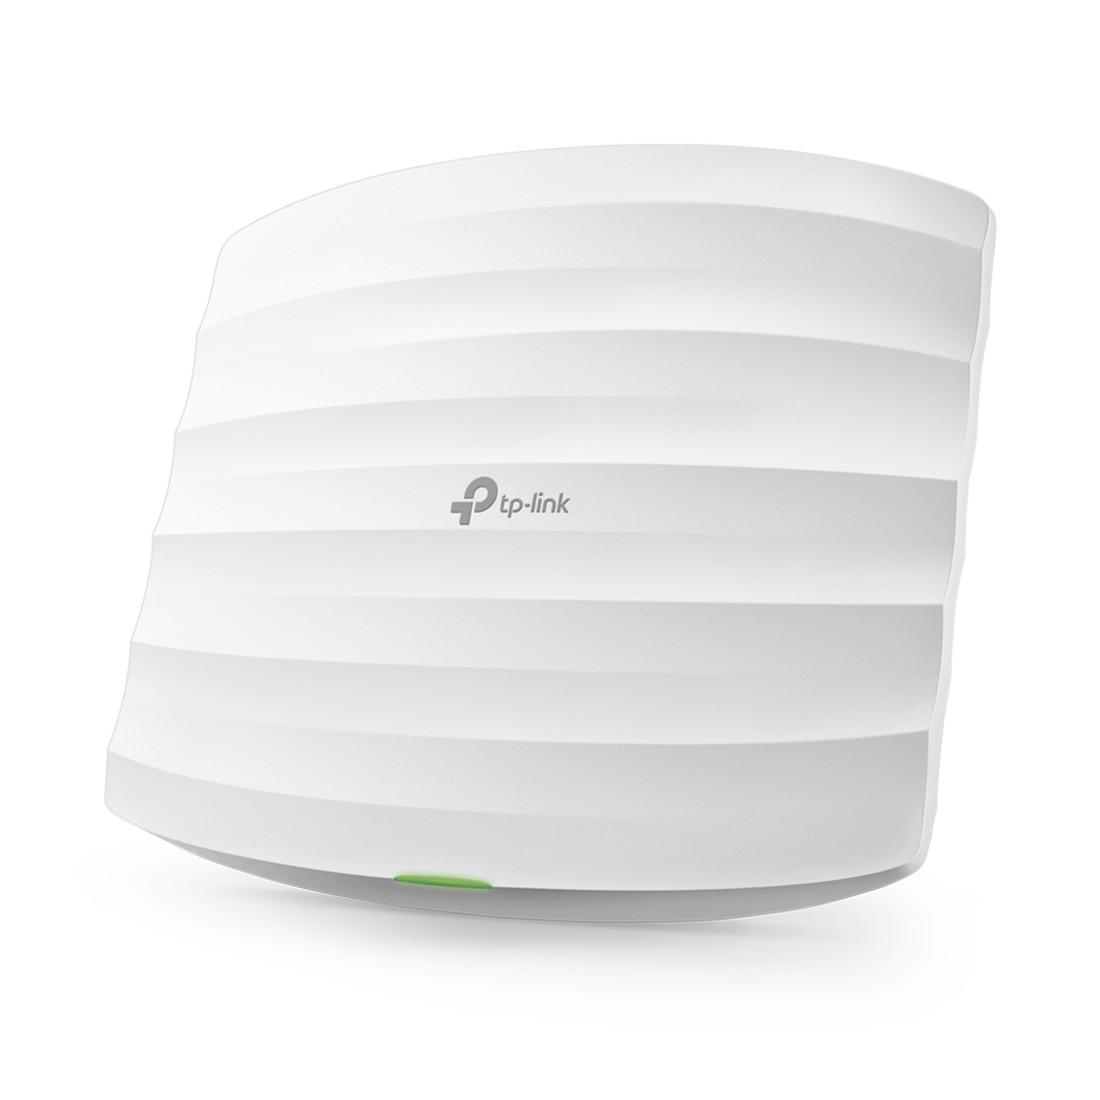 Wi-Fi точка доступа TP-Link EAP110 300 Мбит/с